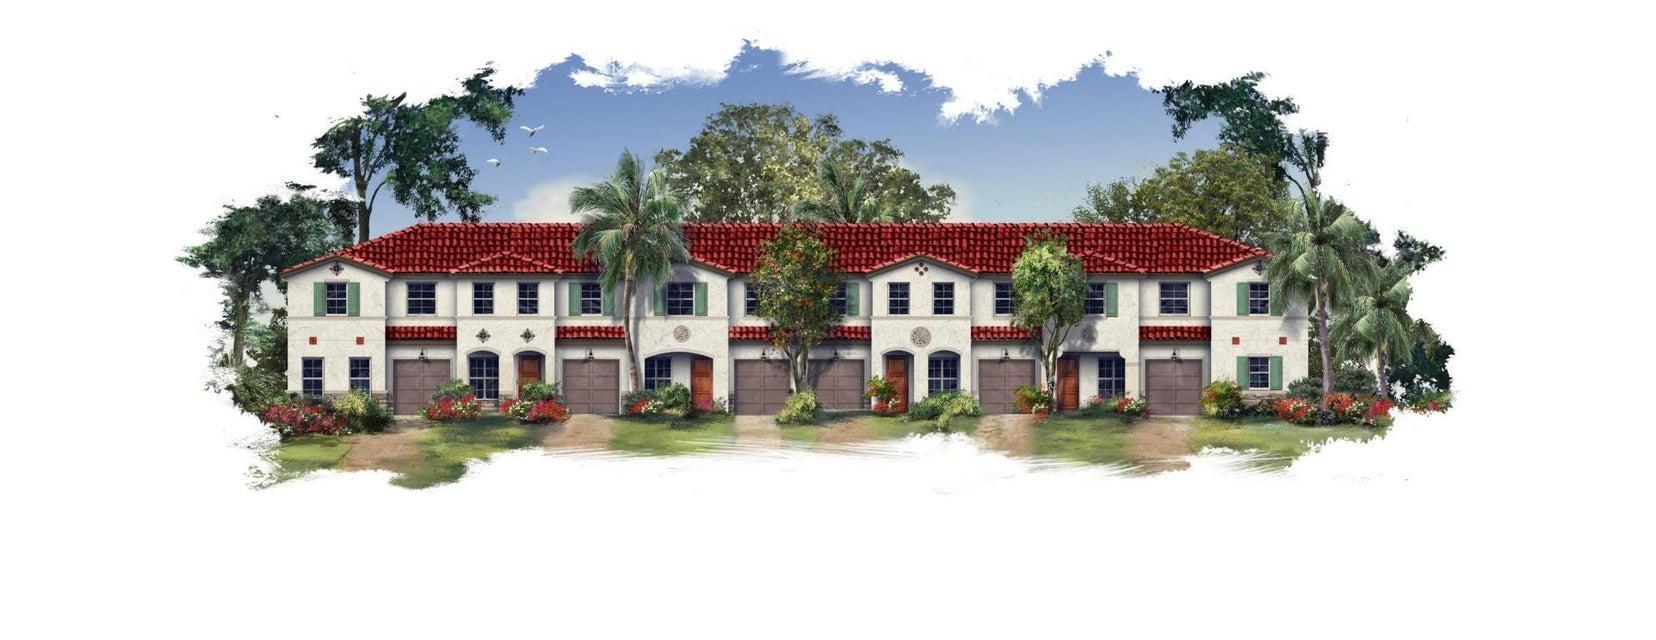 4681 Tara Cove Way, West Palm Beach, FL 33417